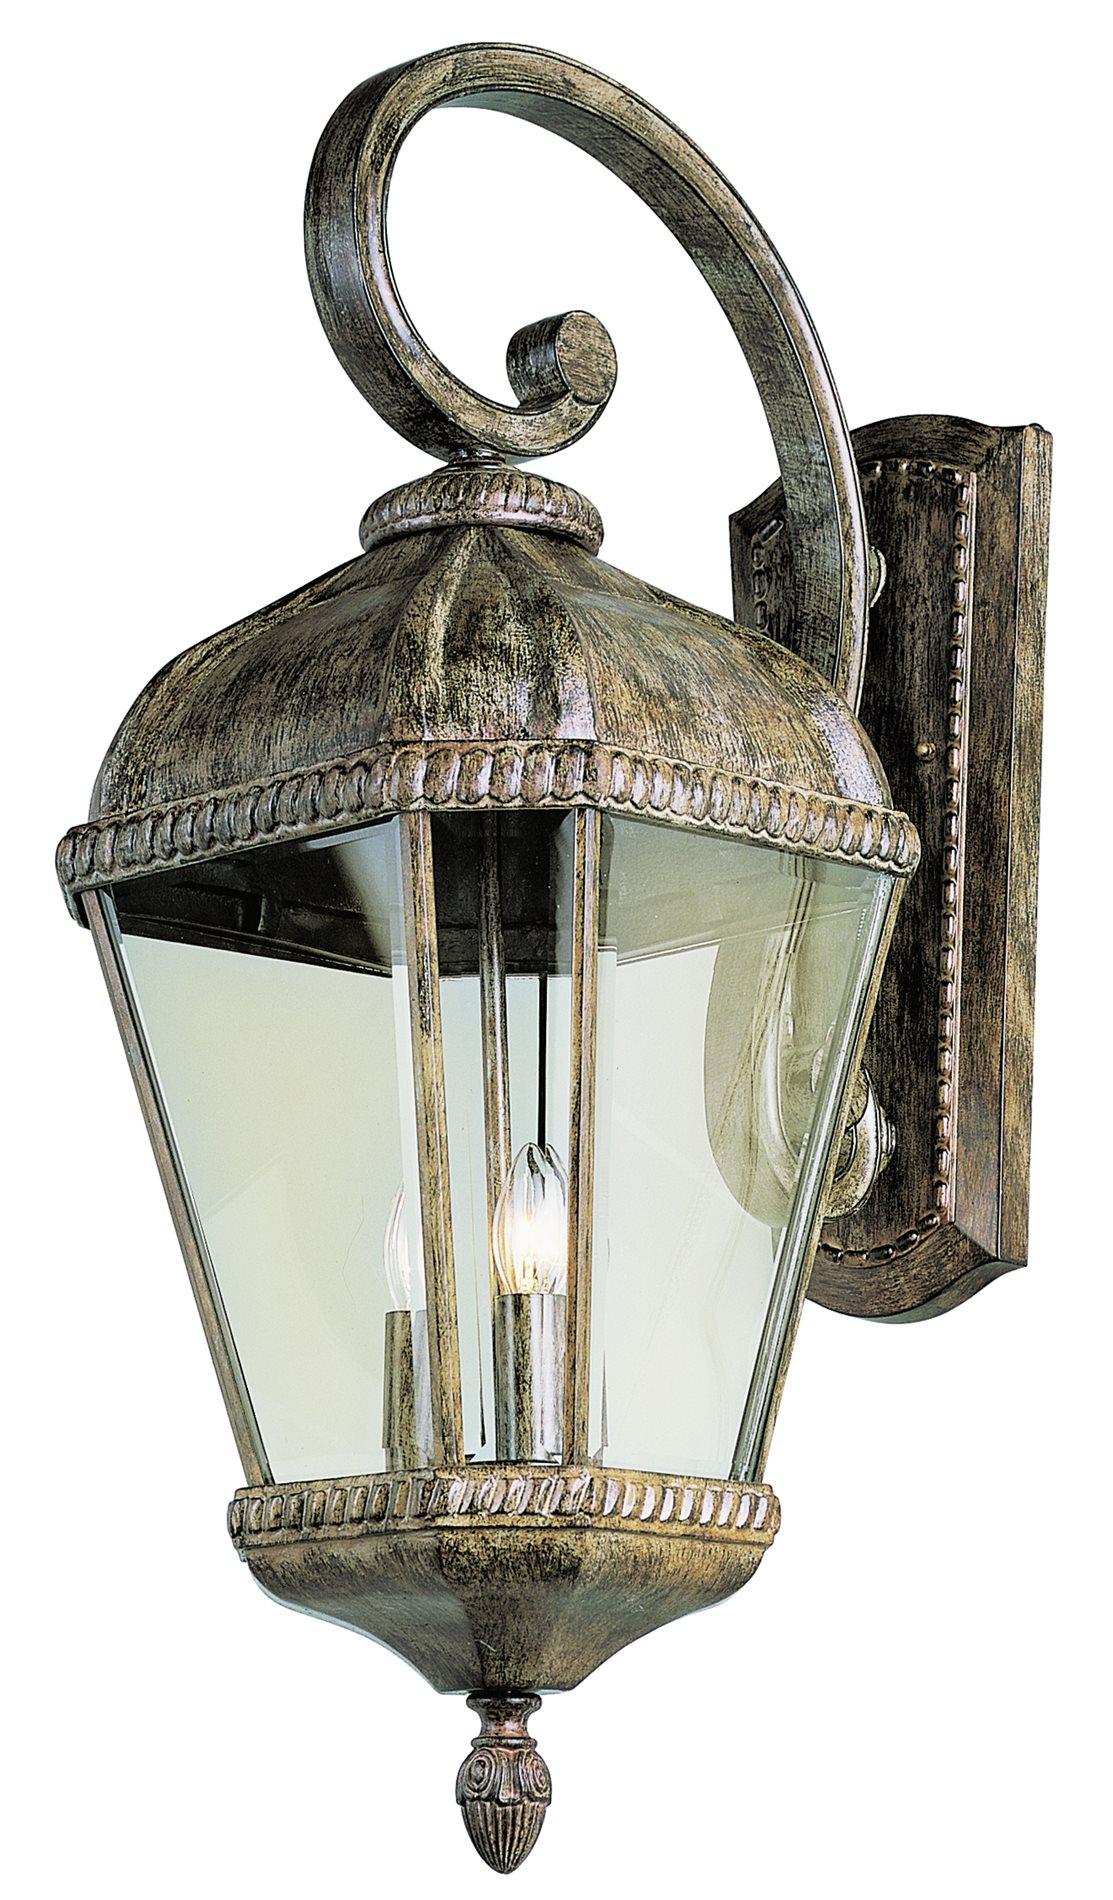 Trans Globe Lighting 5151 Brt Traditional Outdoor Wall